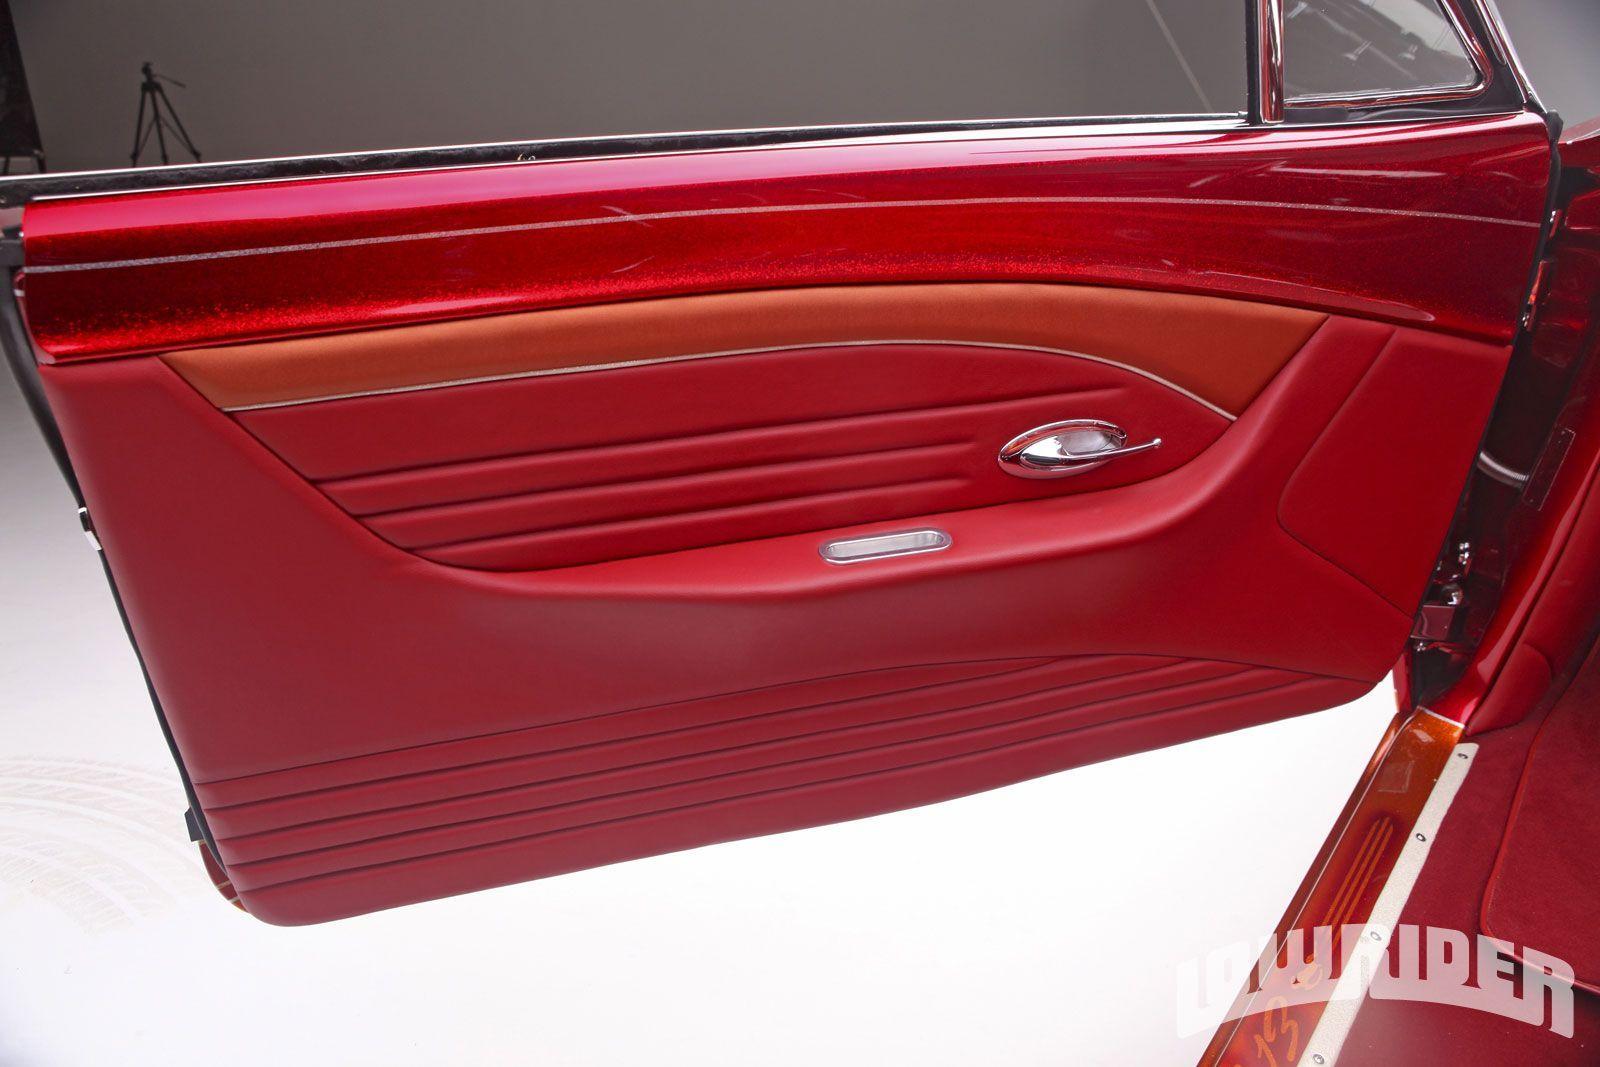 1963 Chevrolet Impala Impala Interior Door Panel Camaro Interior Custom Car Interior Custom Consoles